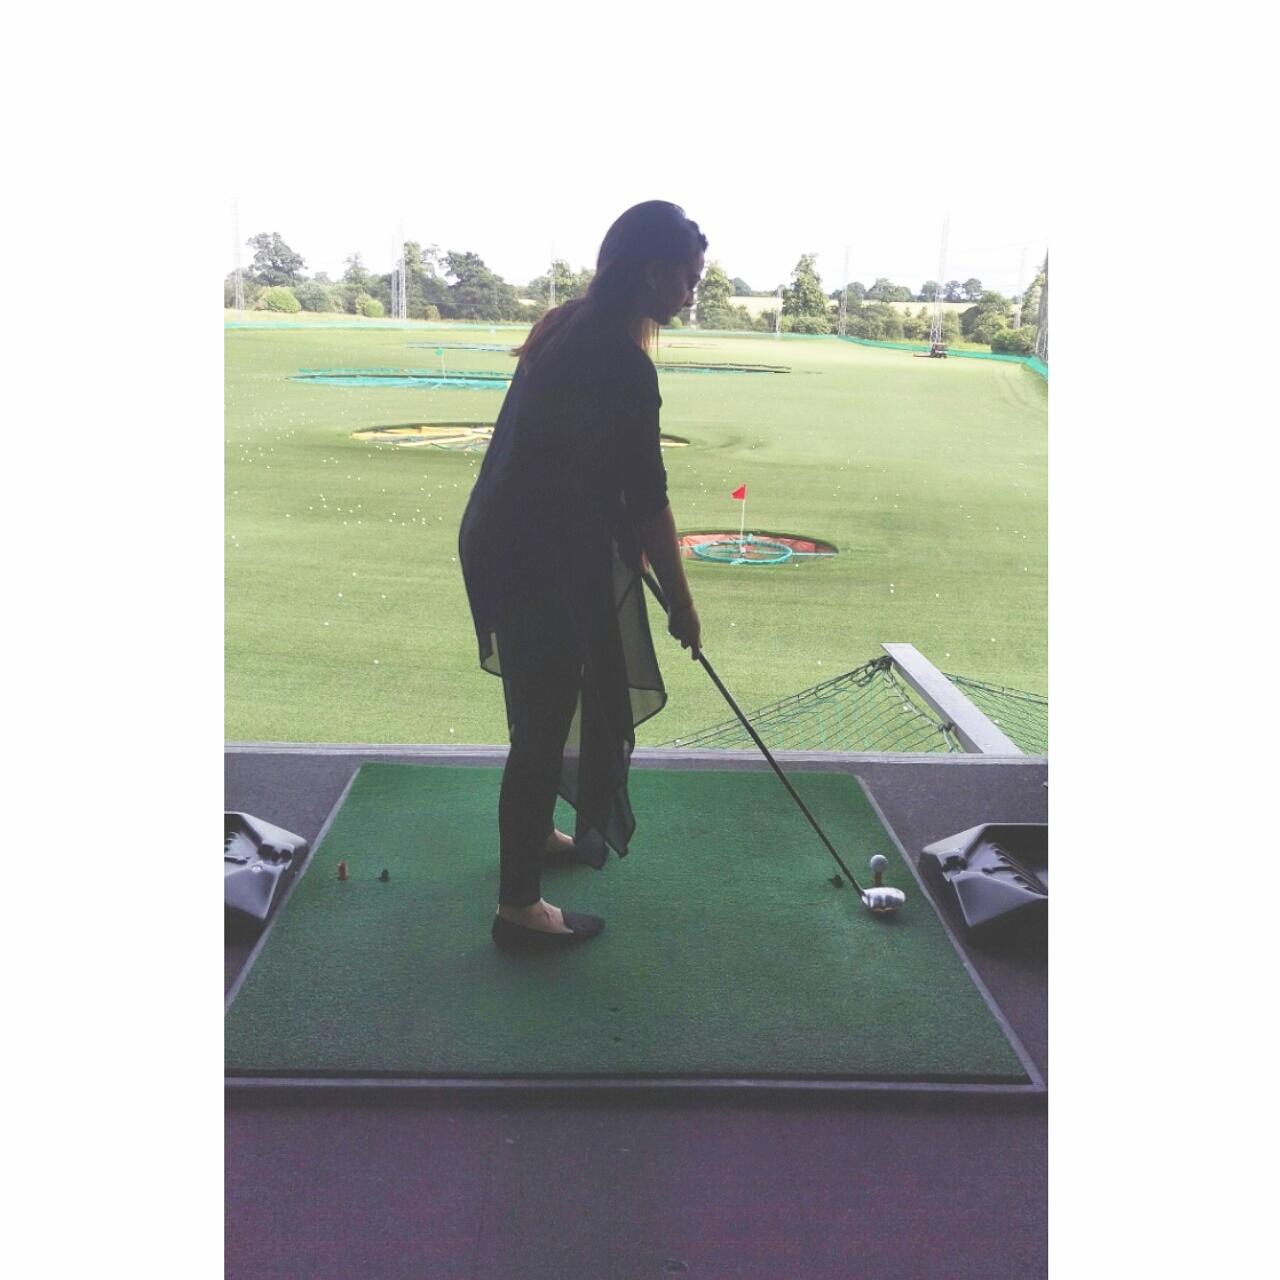 Preparing to swing